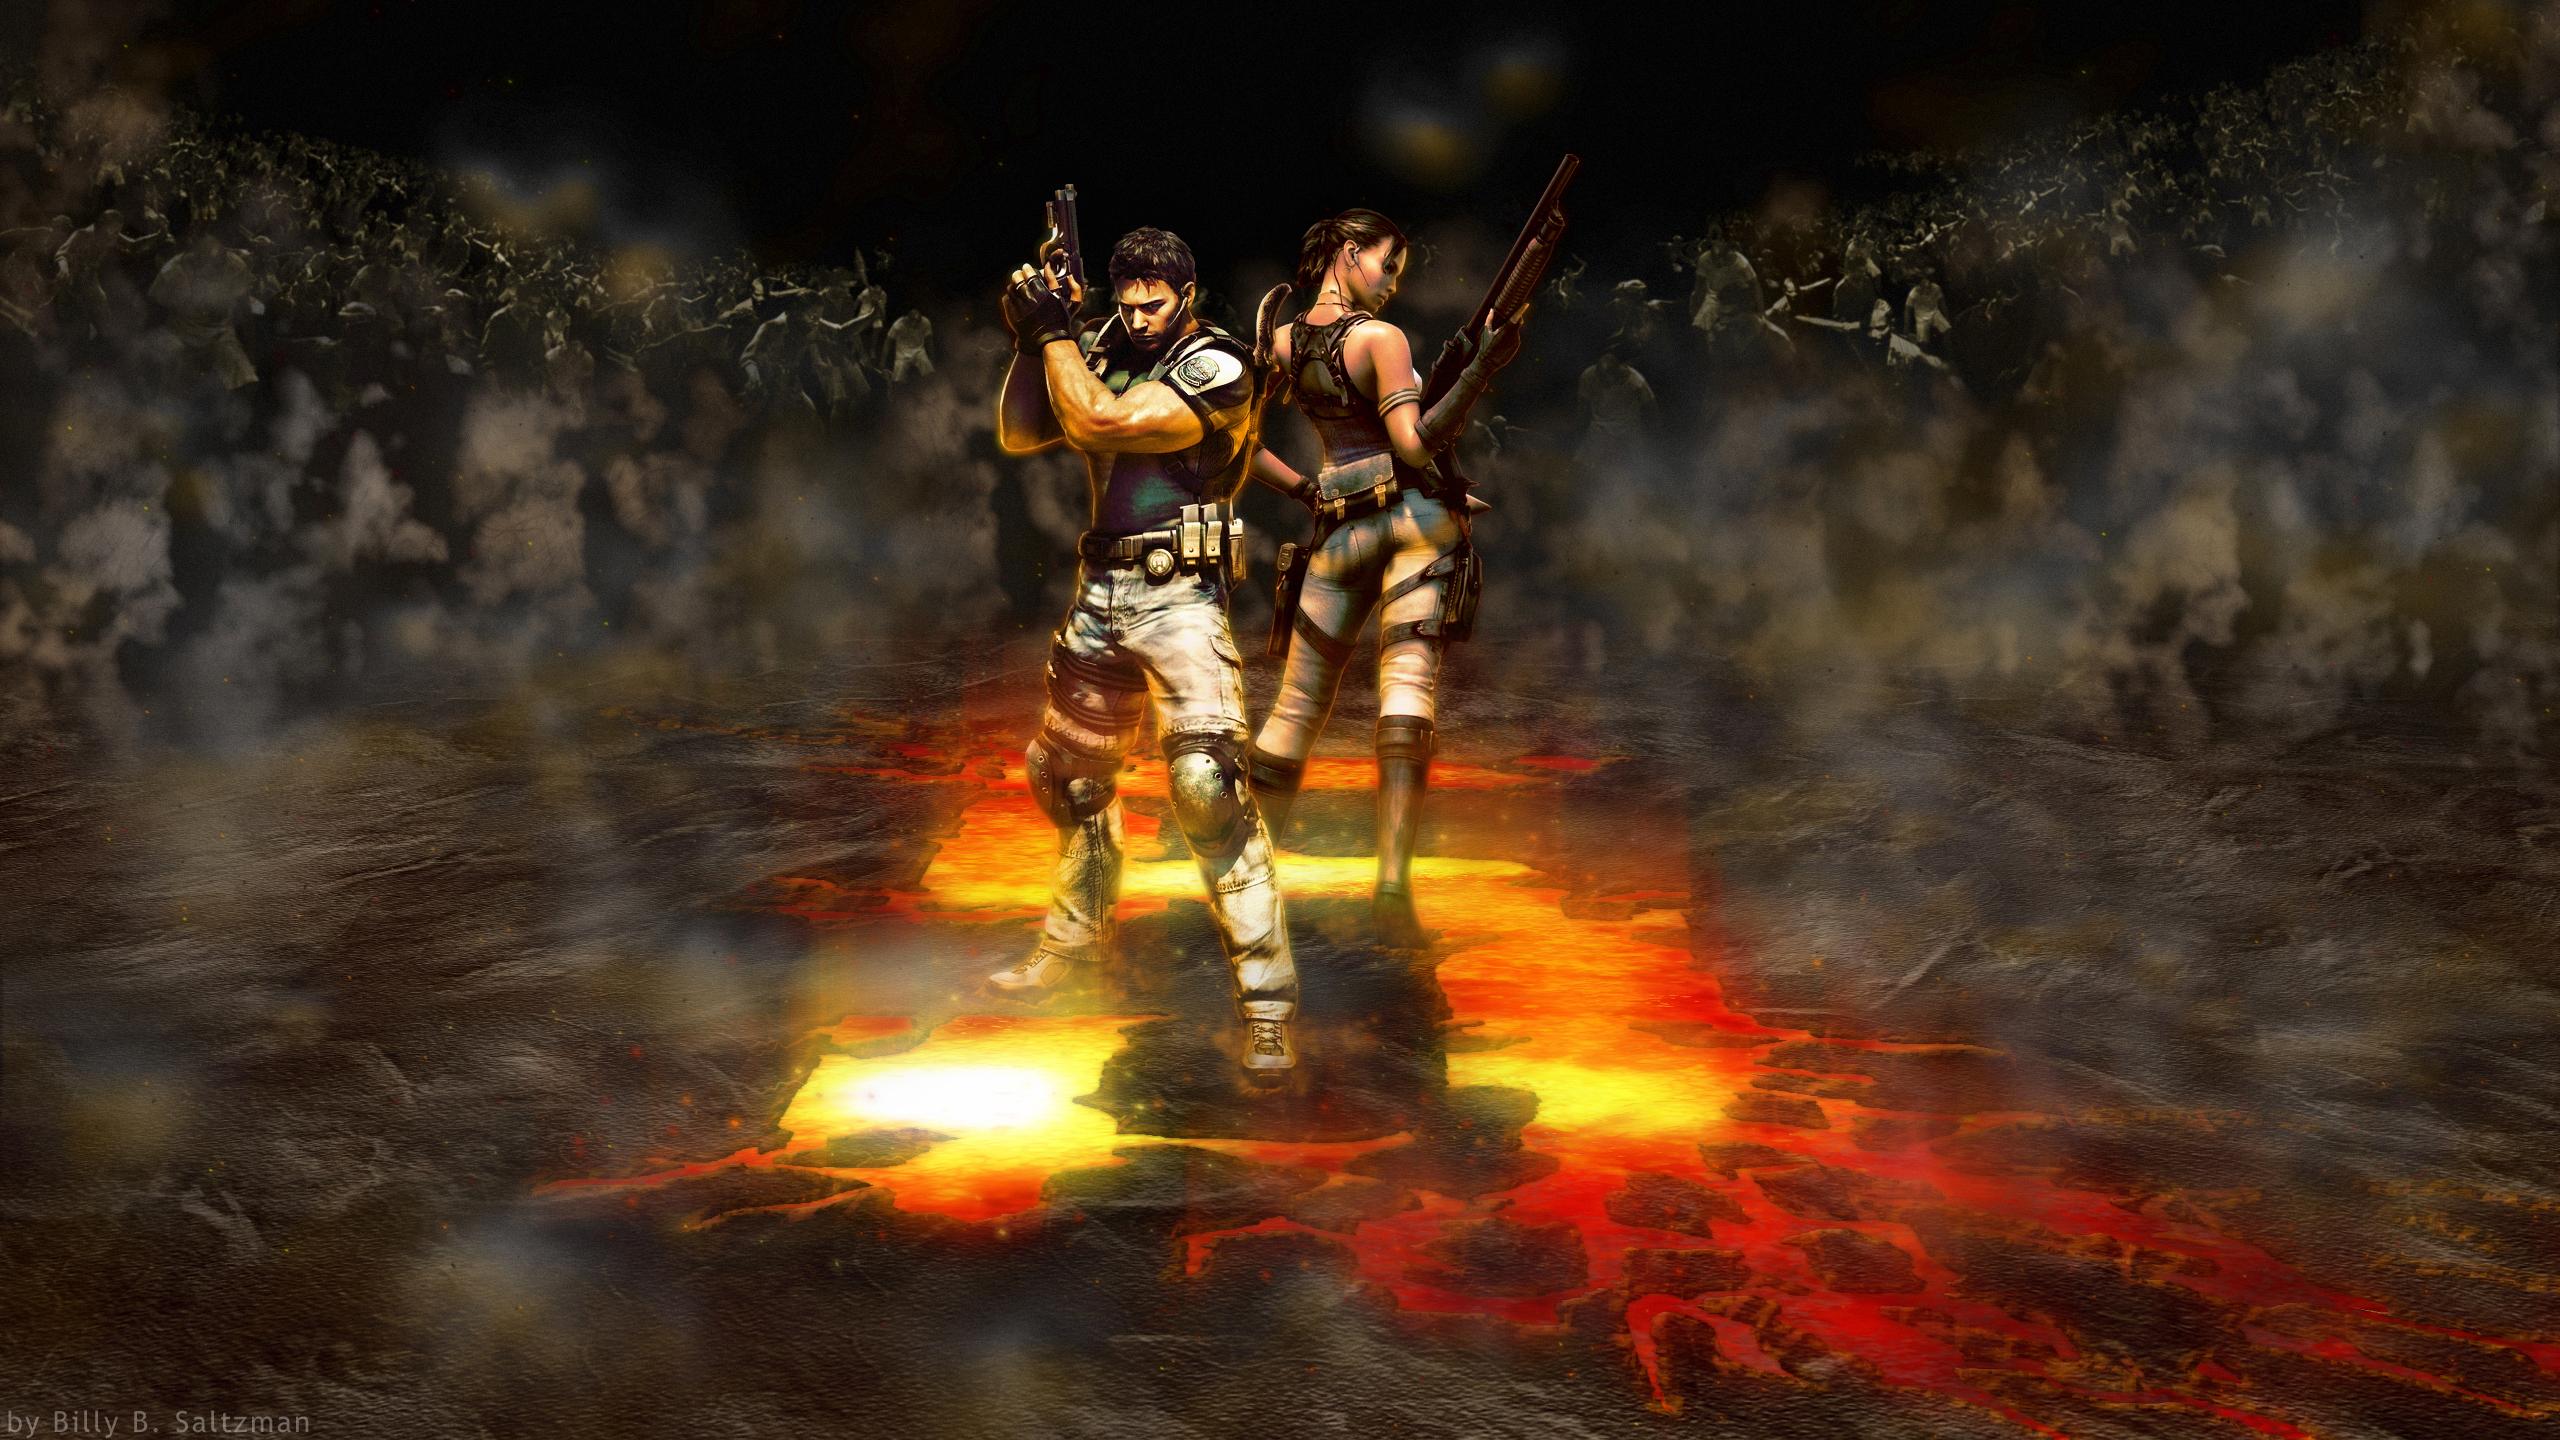 Resident Evil 5 Wallpaper 1 By Billysan291 On Deviantart